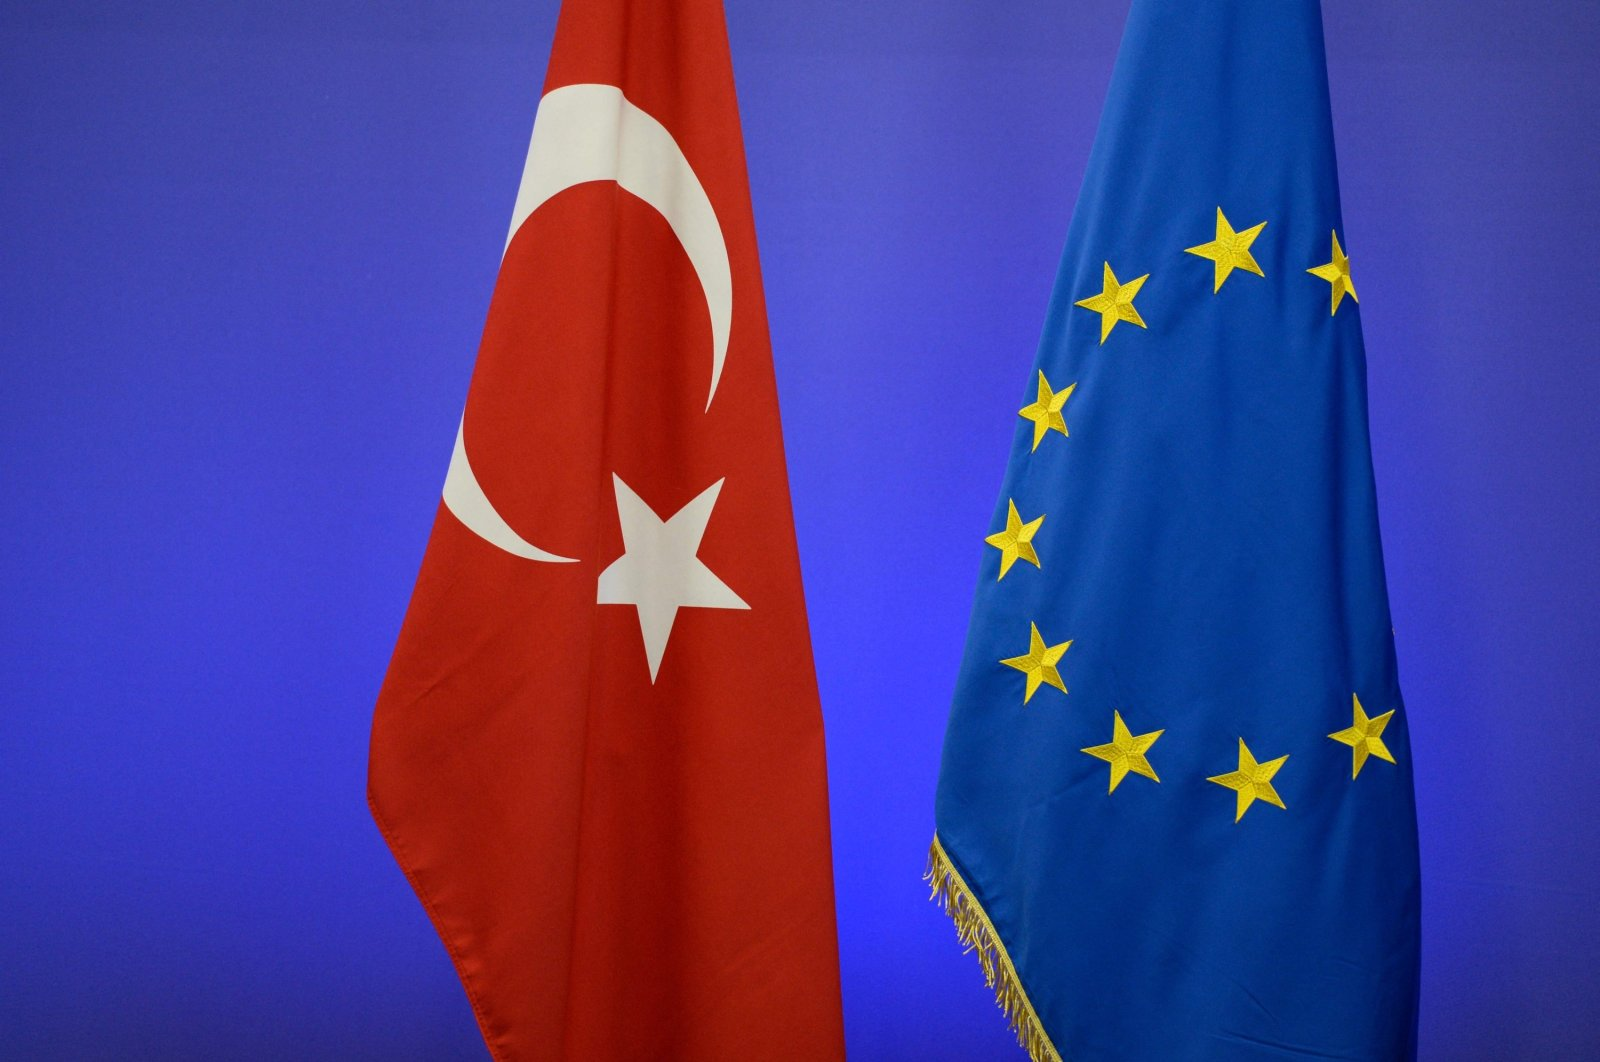 Turkey's EU accession: 'Strategic vision, not fiction'